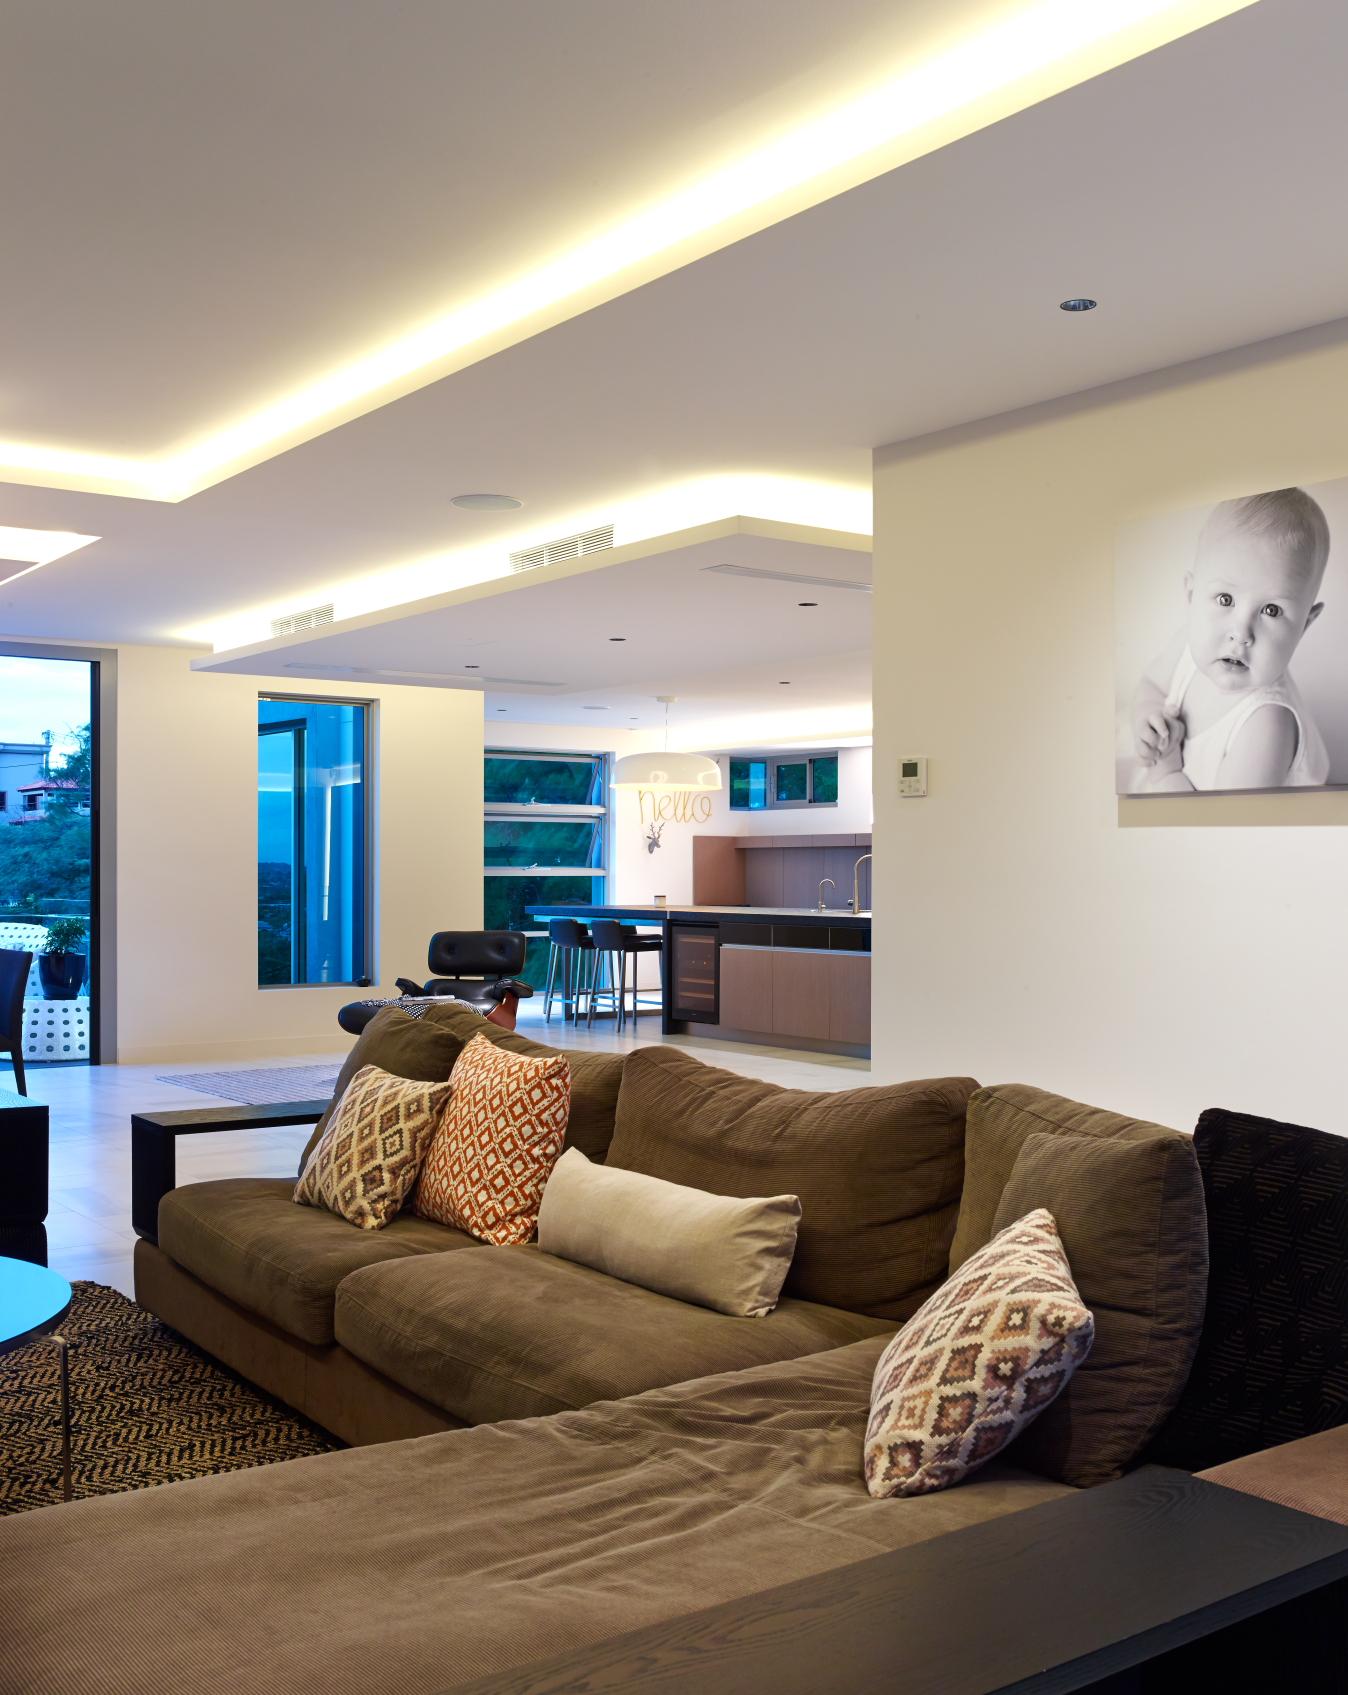 Hamilton Residence_044.JPG